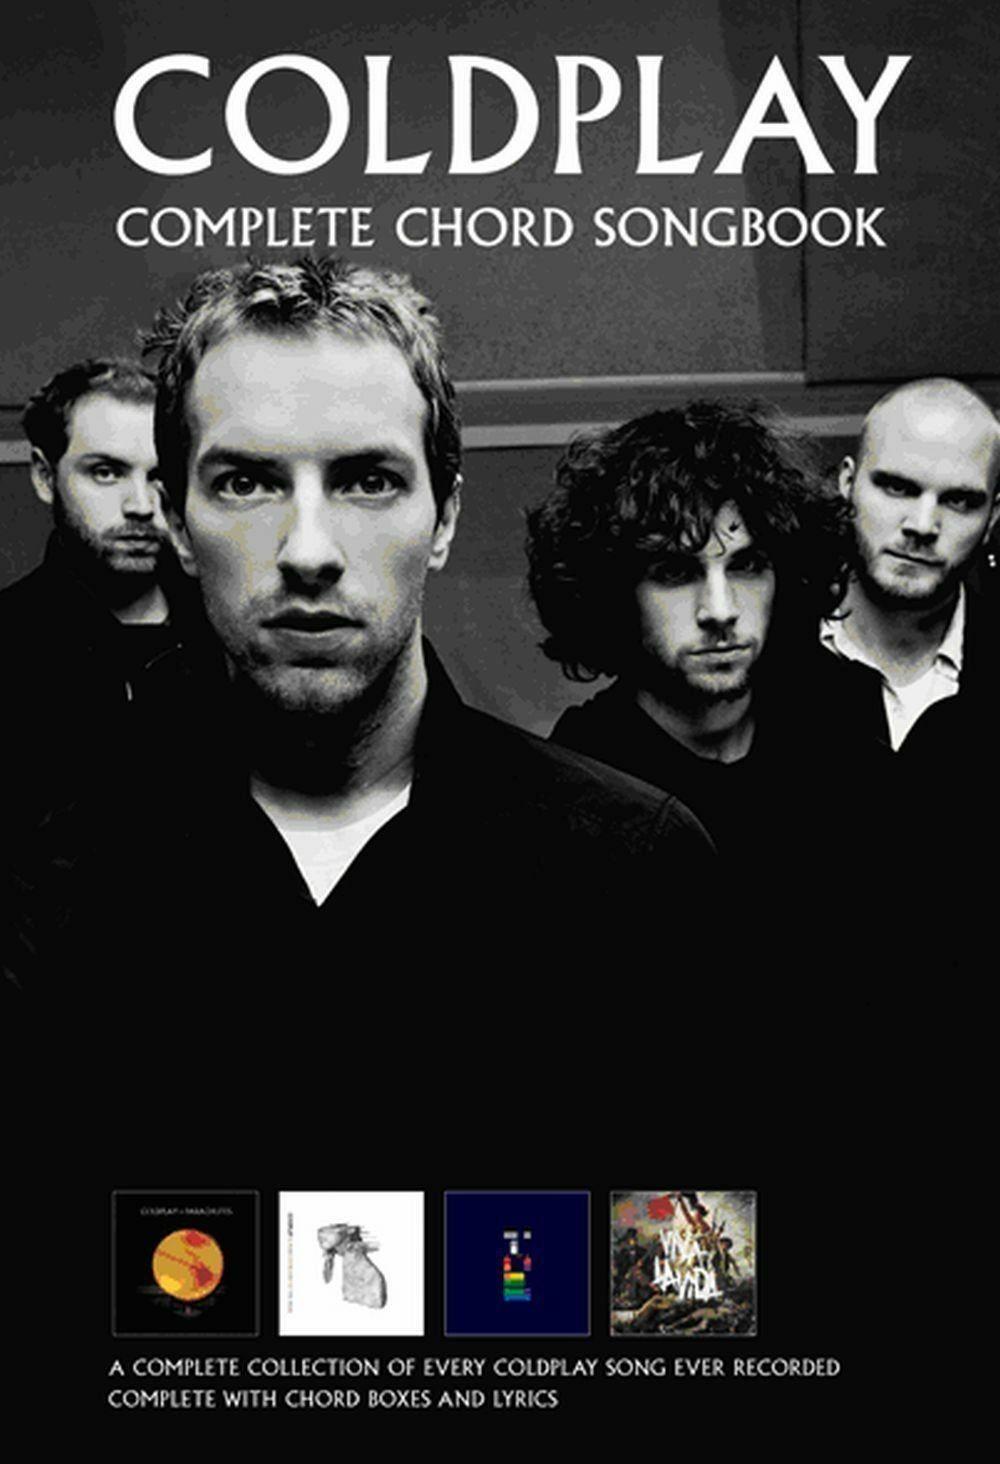 Coldplay Complete Chord Songbook Music Sheet All Songs Original Key Lyrics S126